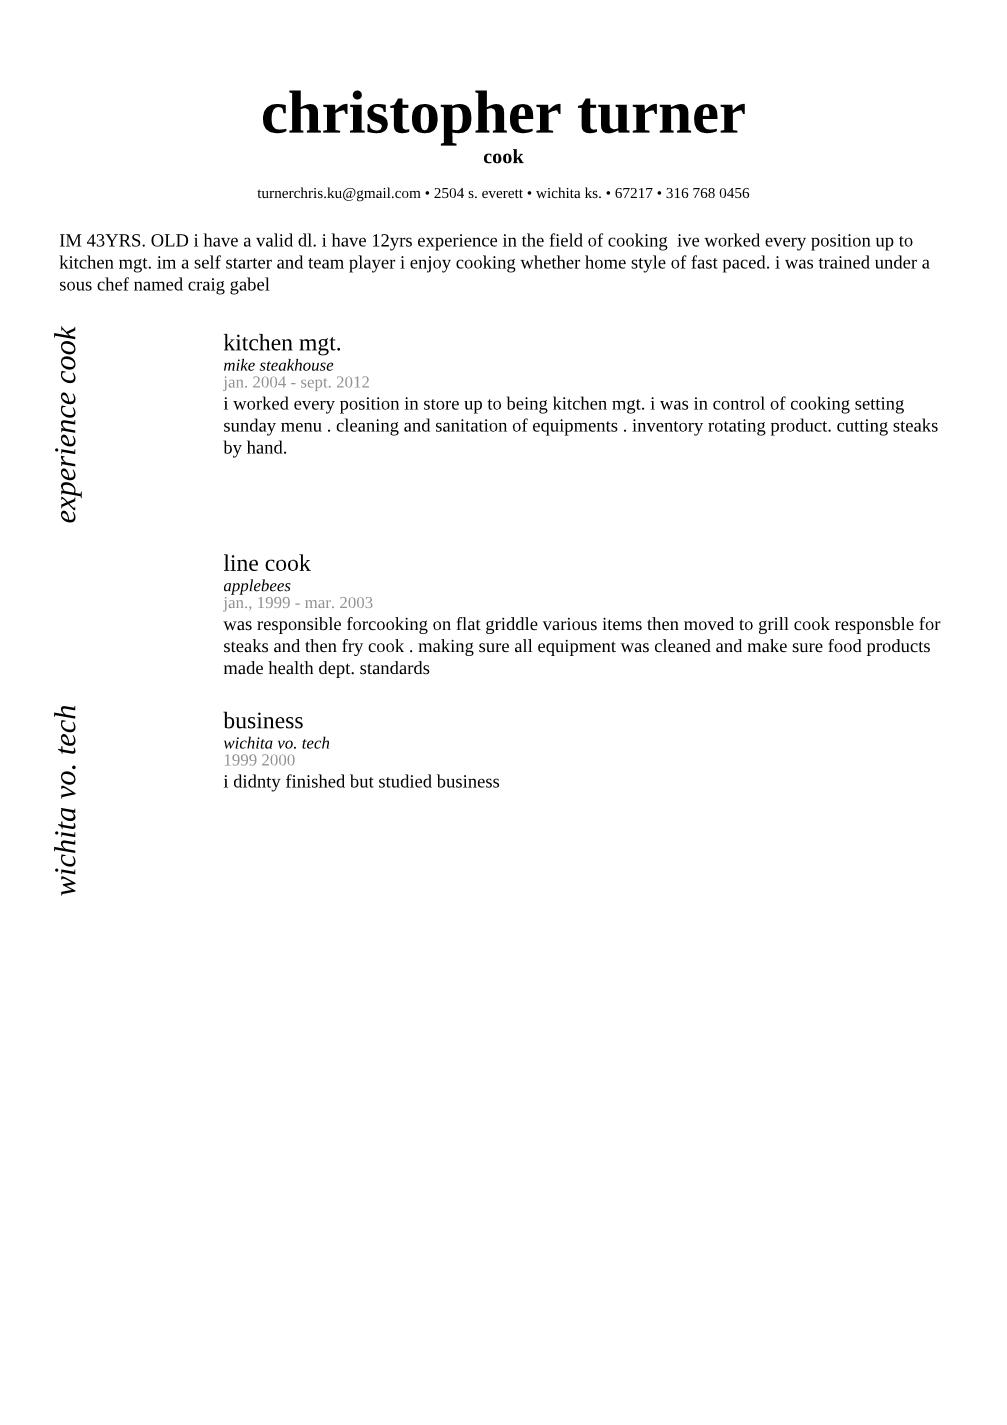 App Developer Resume + Cover Letter + Portfolio (With